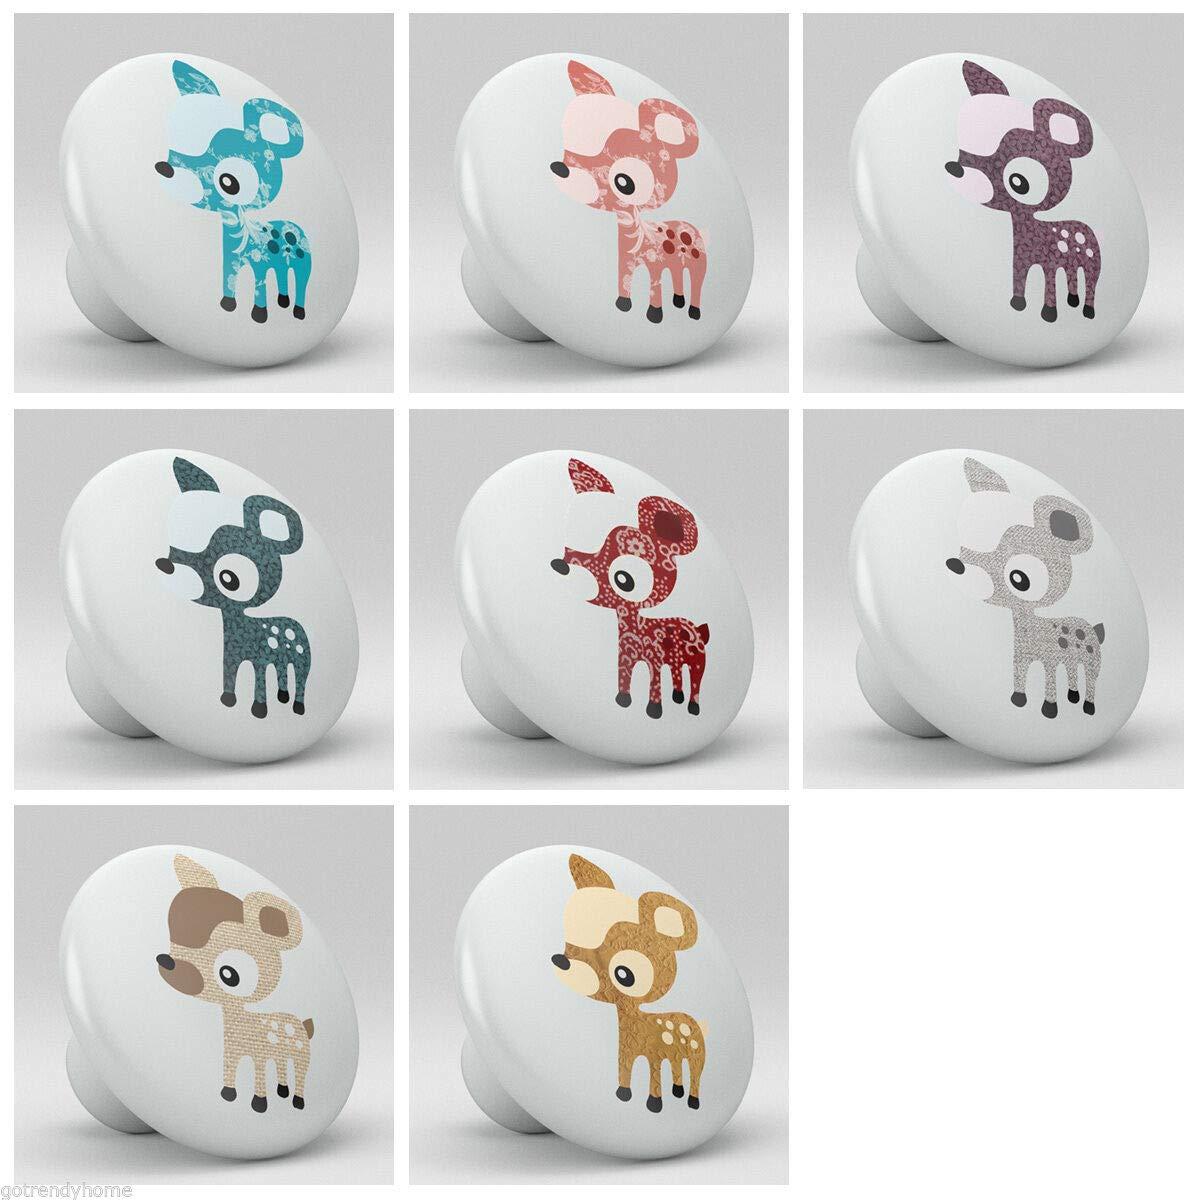 Charliebrown Knobs Set of 8 Baby Deer Fawn Nursery Ceramic Knobs Pulls Closet Drawer Dresser 1100 by Charliebrown